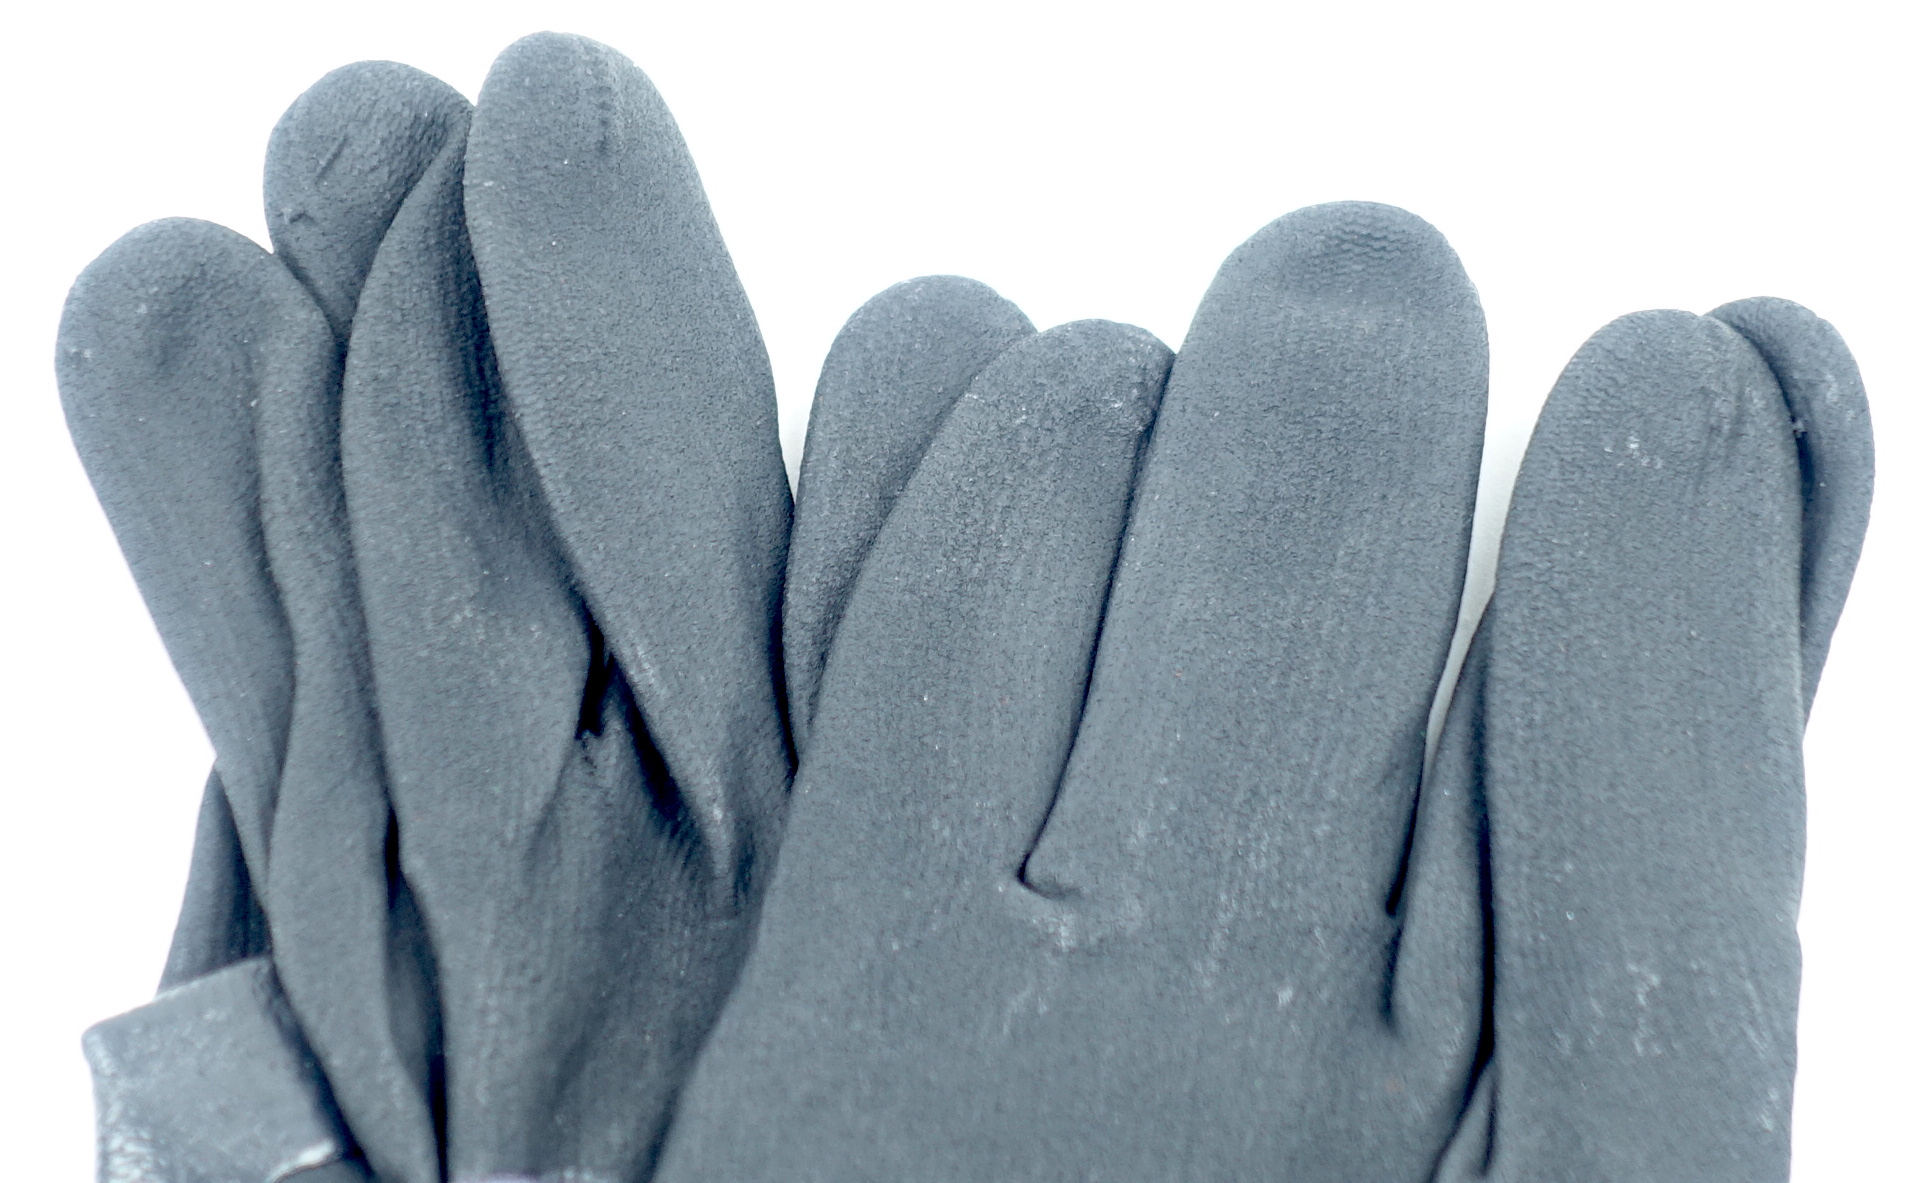 "Oeko-Tex S752-8572-0-9L SFT1 Standard 100 9"" Large Glove Gray/Black 1 Pair - image 3"